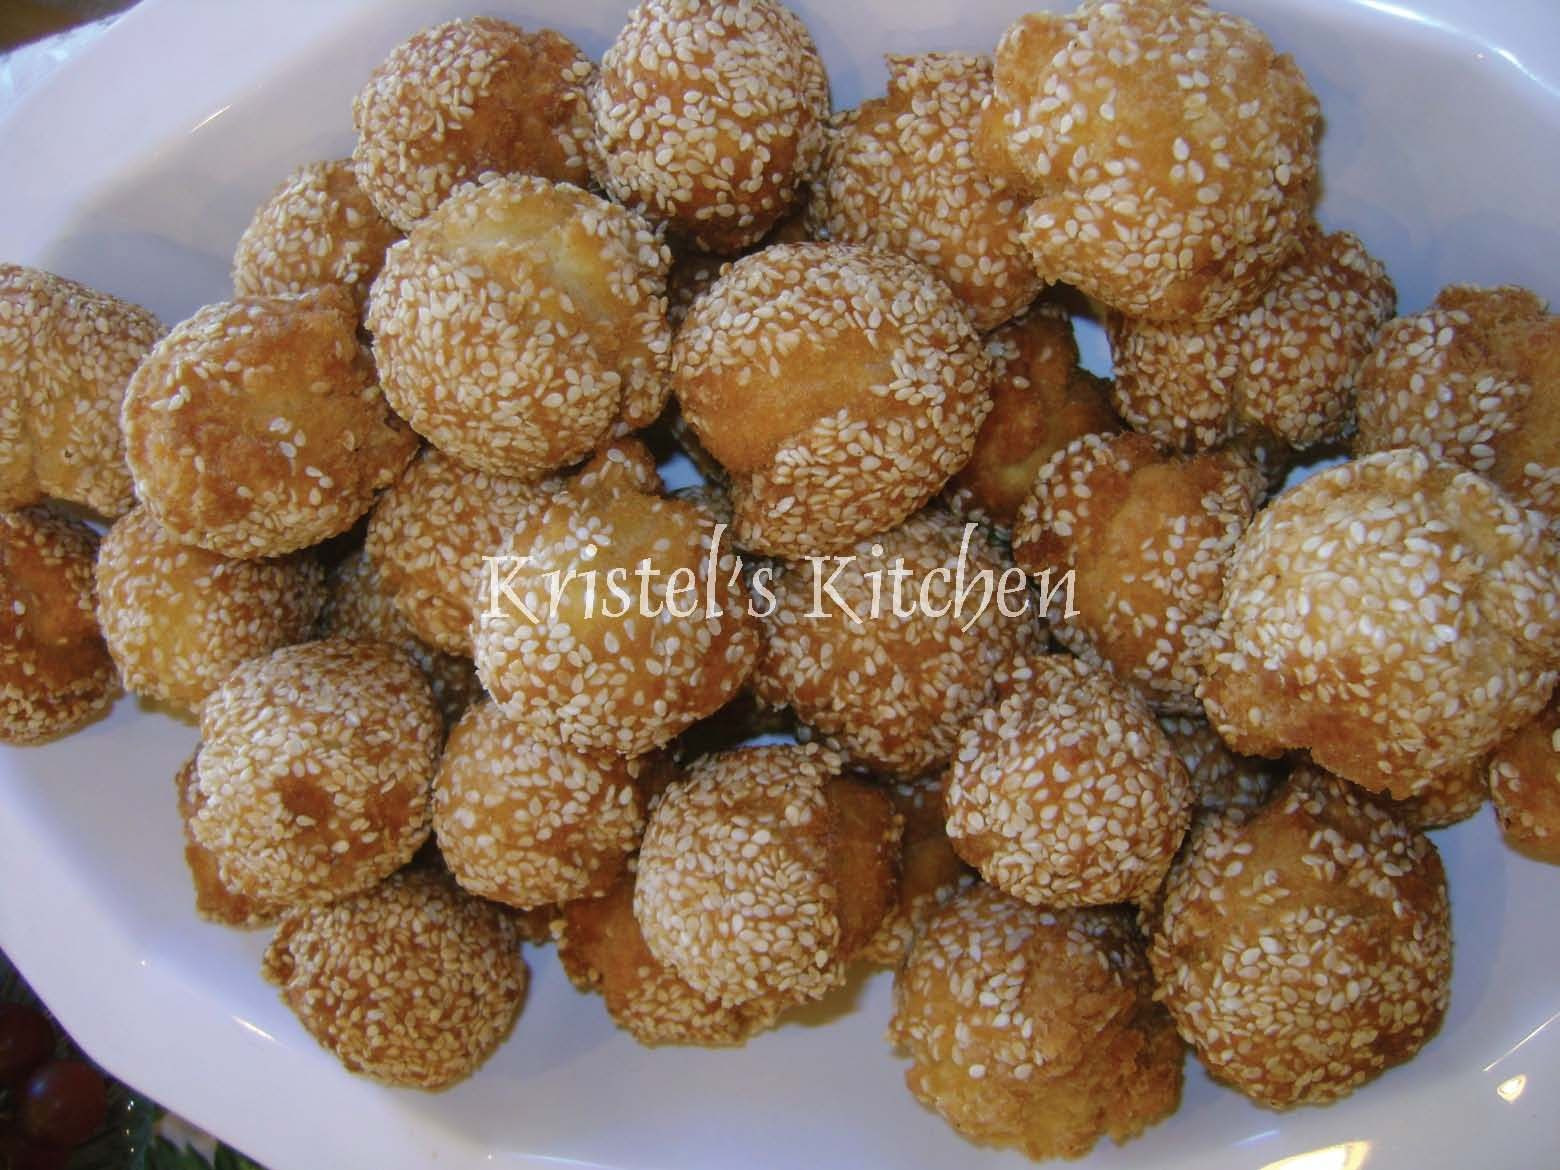 52 Filipino Desserts Recipes  Kristel s Kitchen Binangkal Sesame Seed Balls